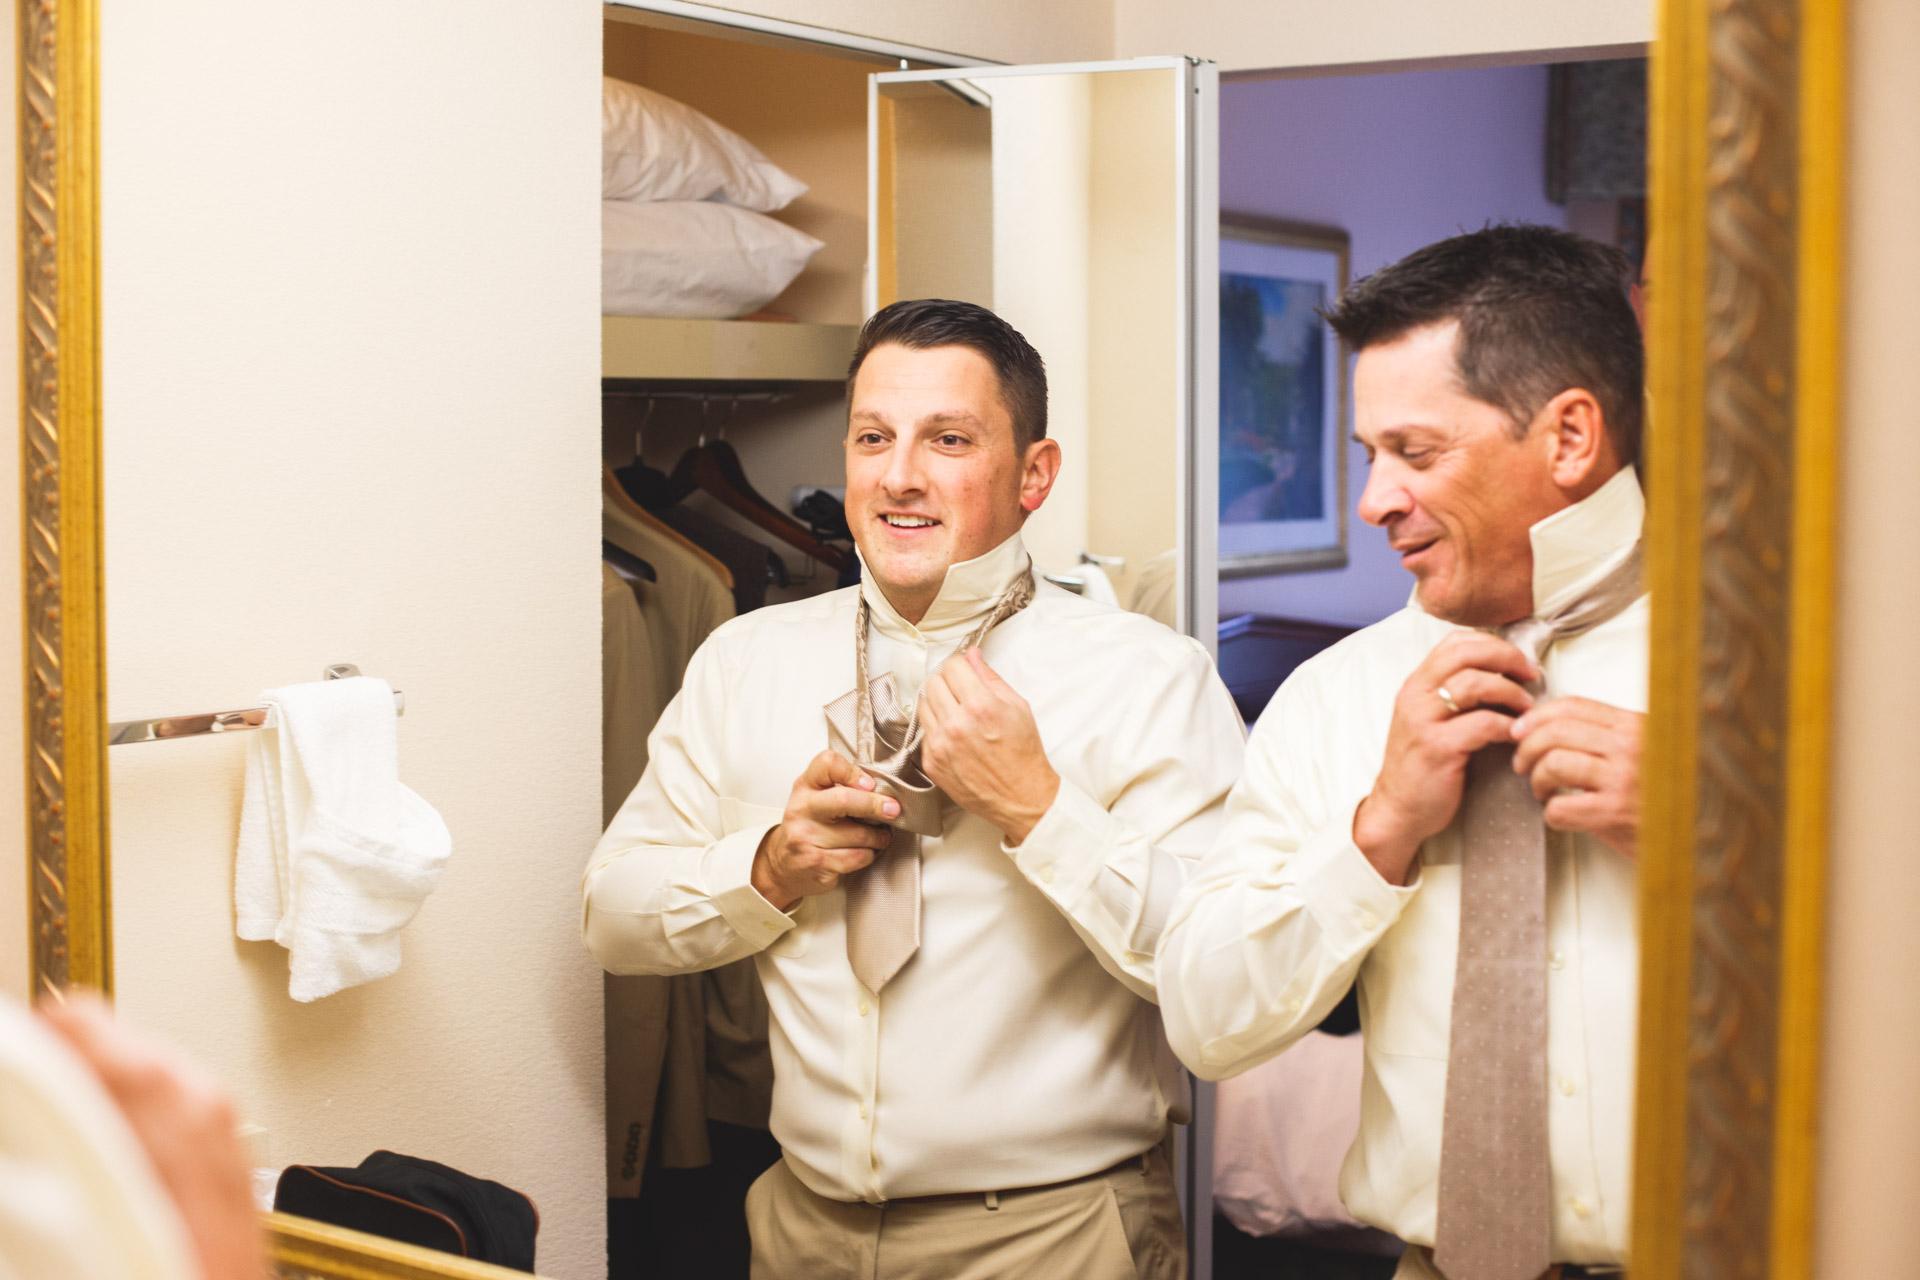 Wedding Photos at Webb Barn Wethersfield -4.jpg